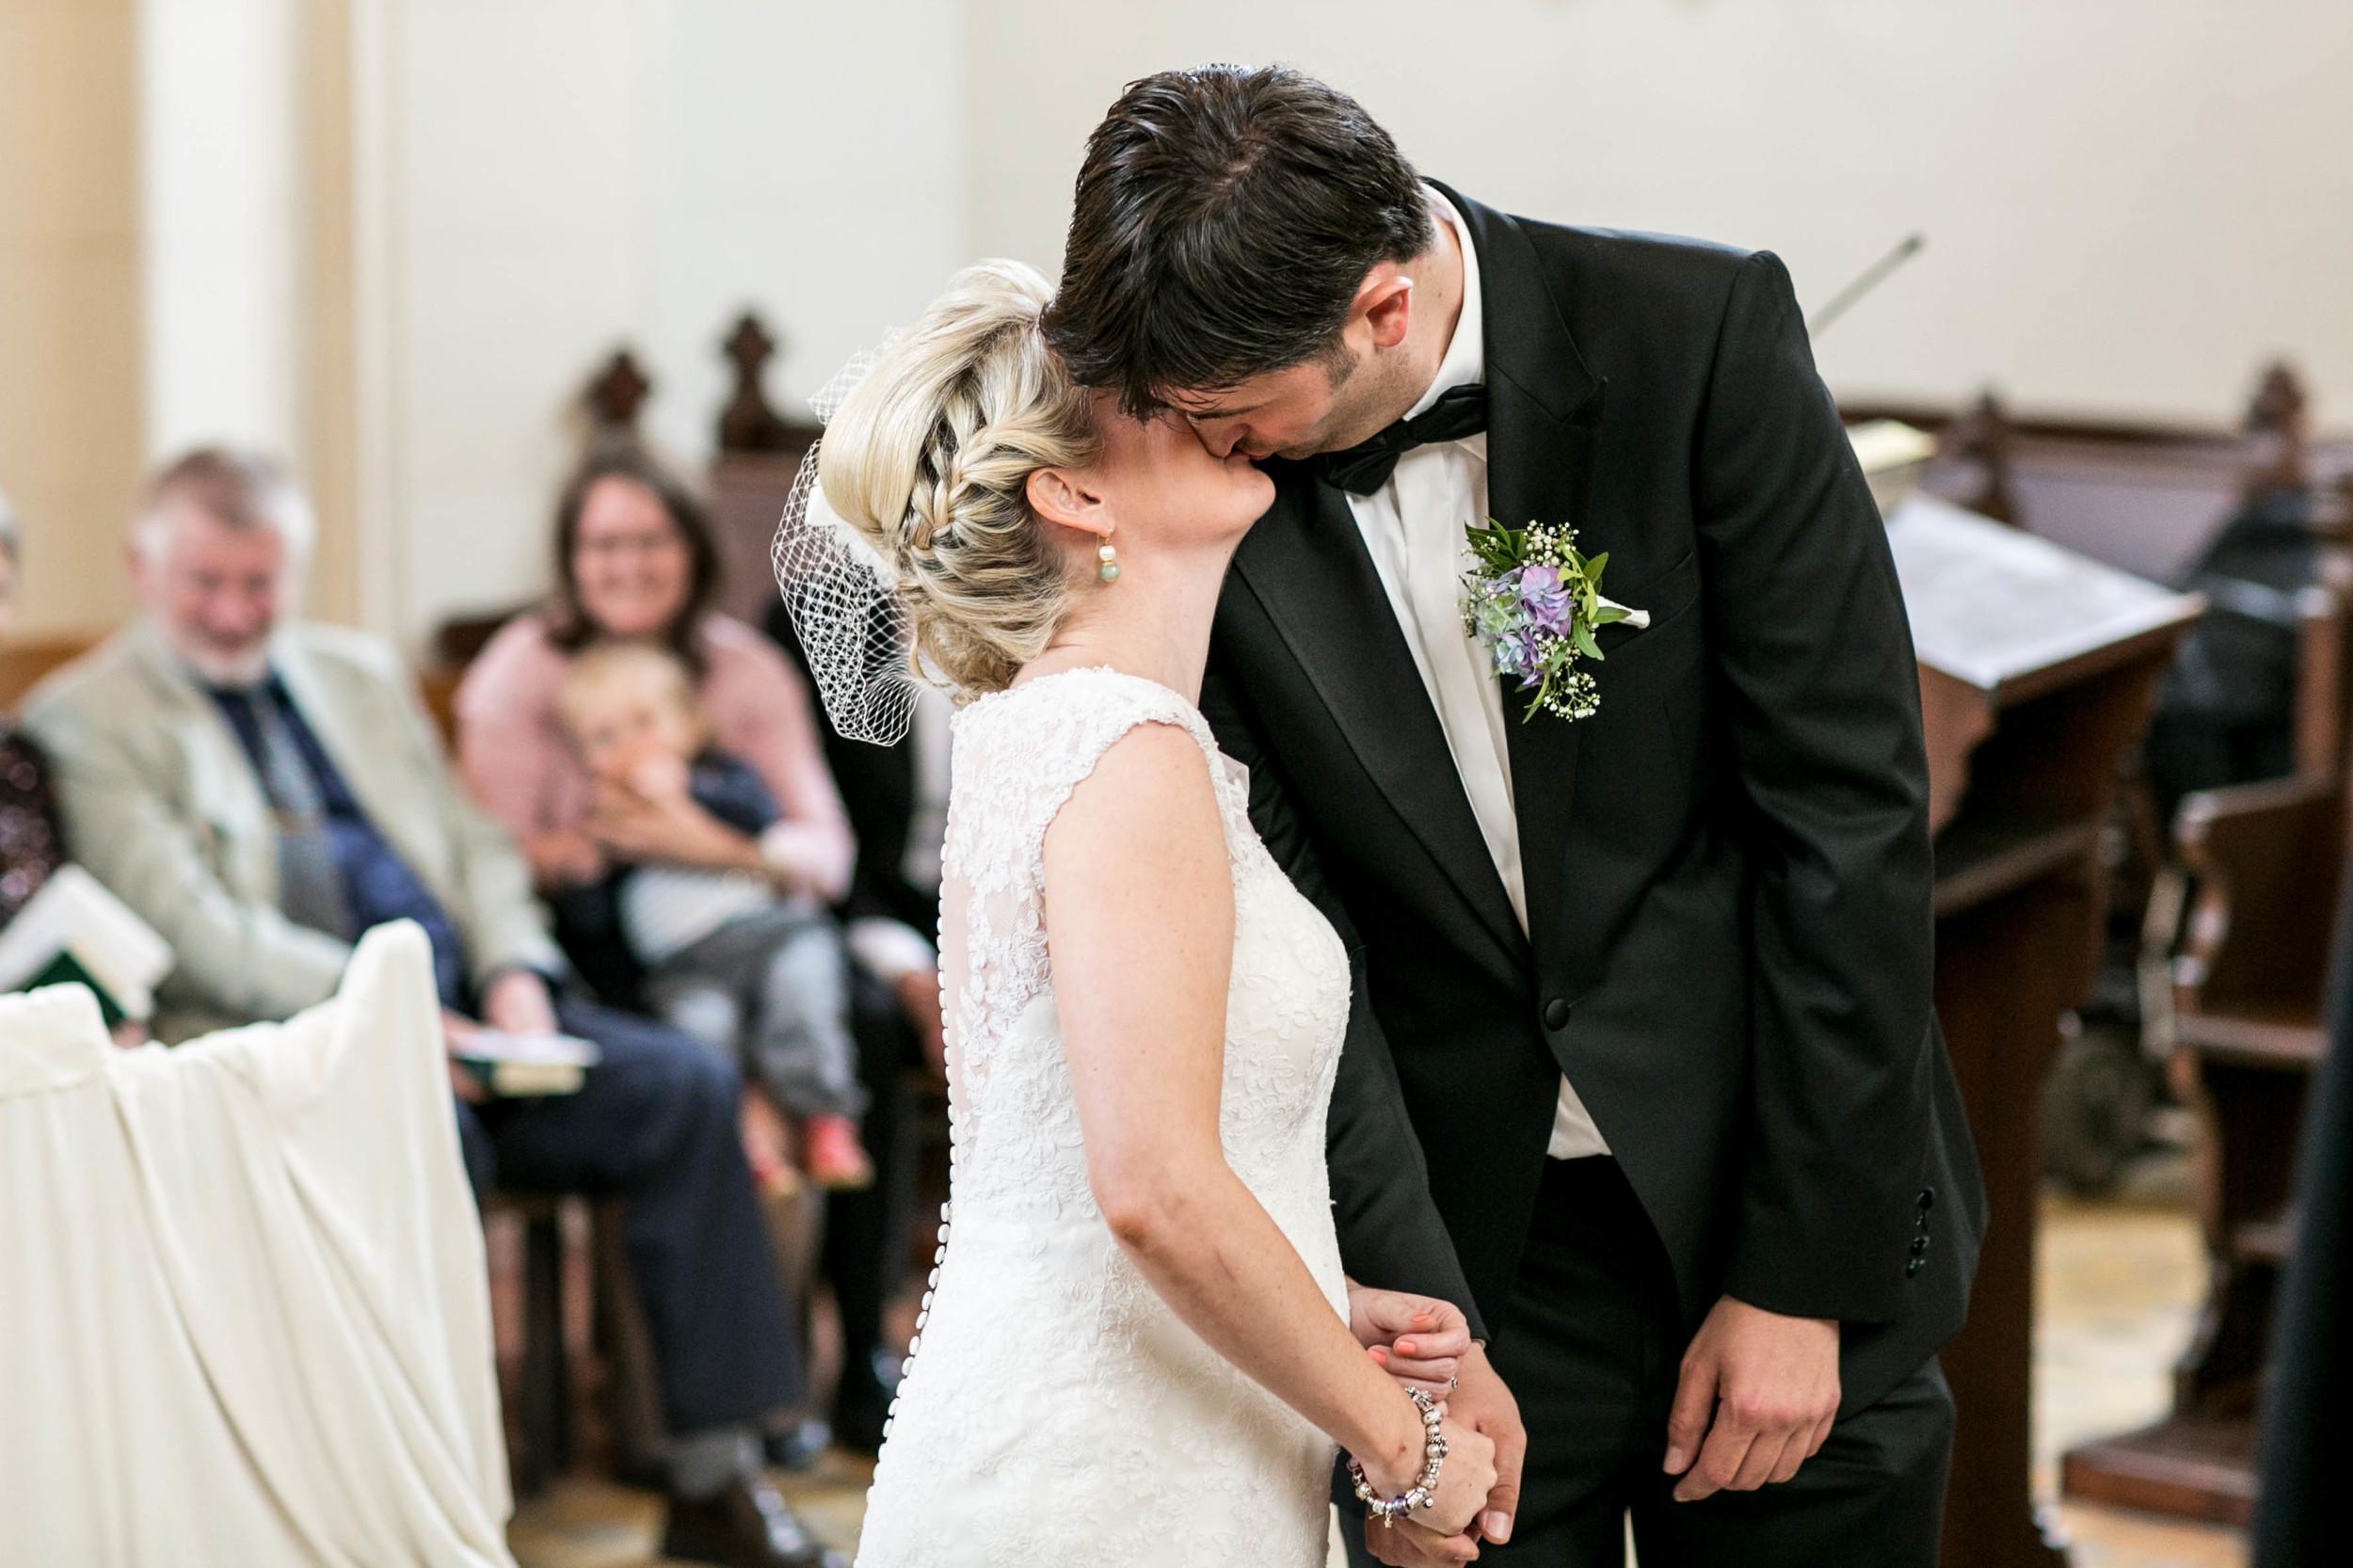 Hochzeitsfotografie Berlin_Fran Burrows Fotografie_17.jpg